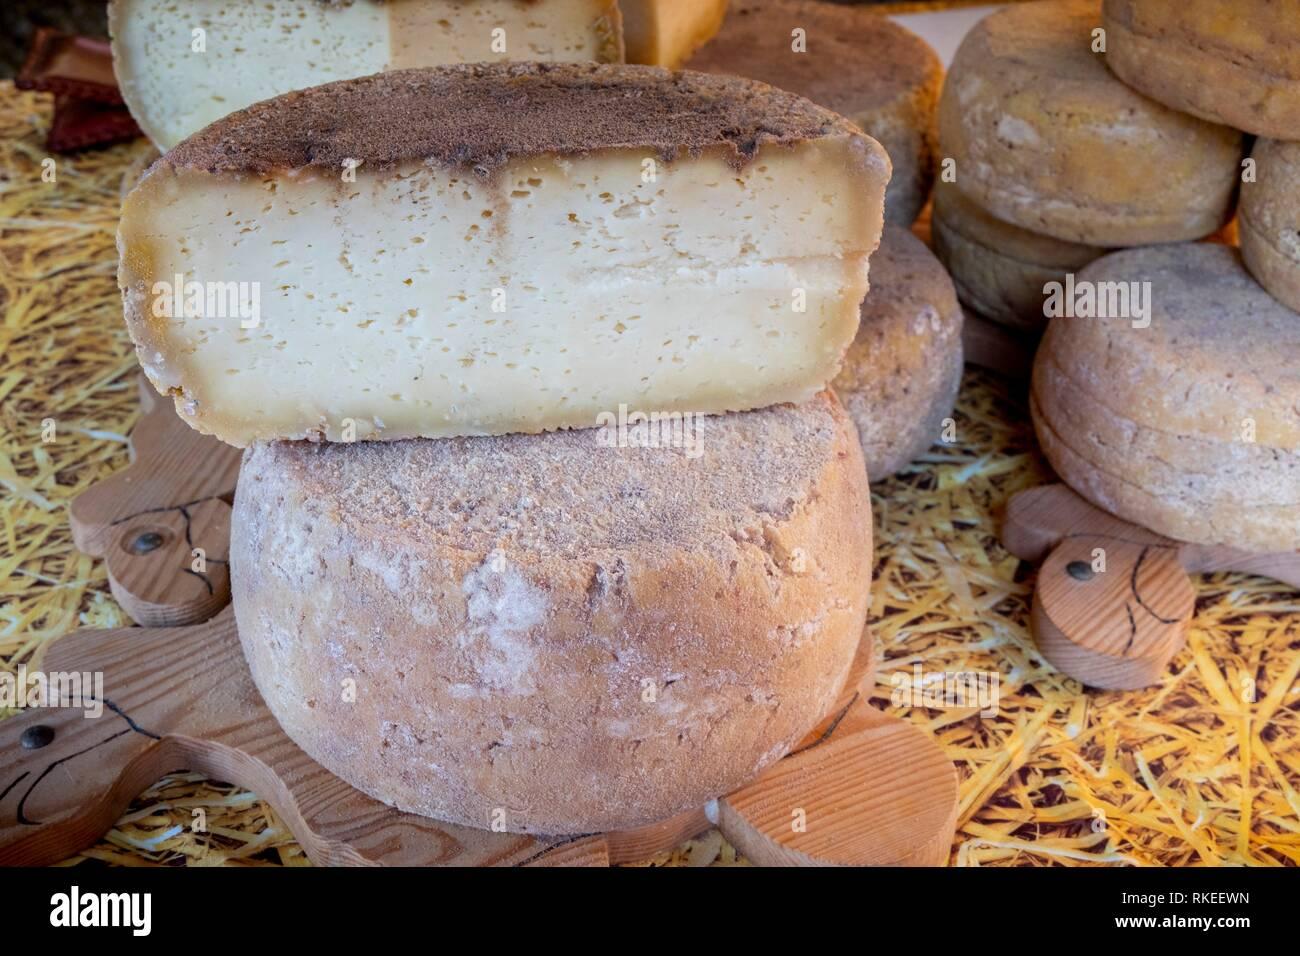 France, Auvergne, Cantal, Sheep milk cheese at Sainte Urcize. Pilgrimage way to Santiago de Compostela. - Stock Image